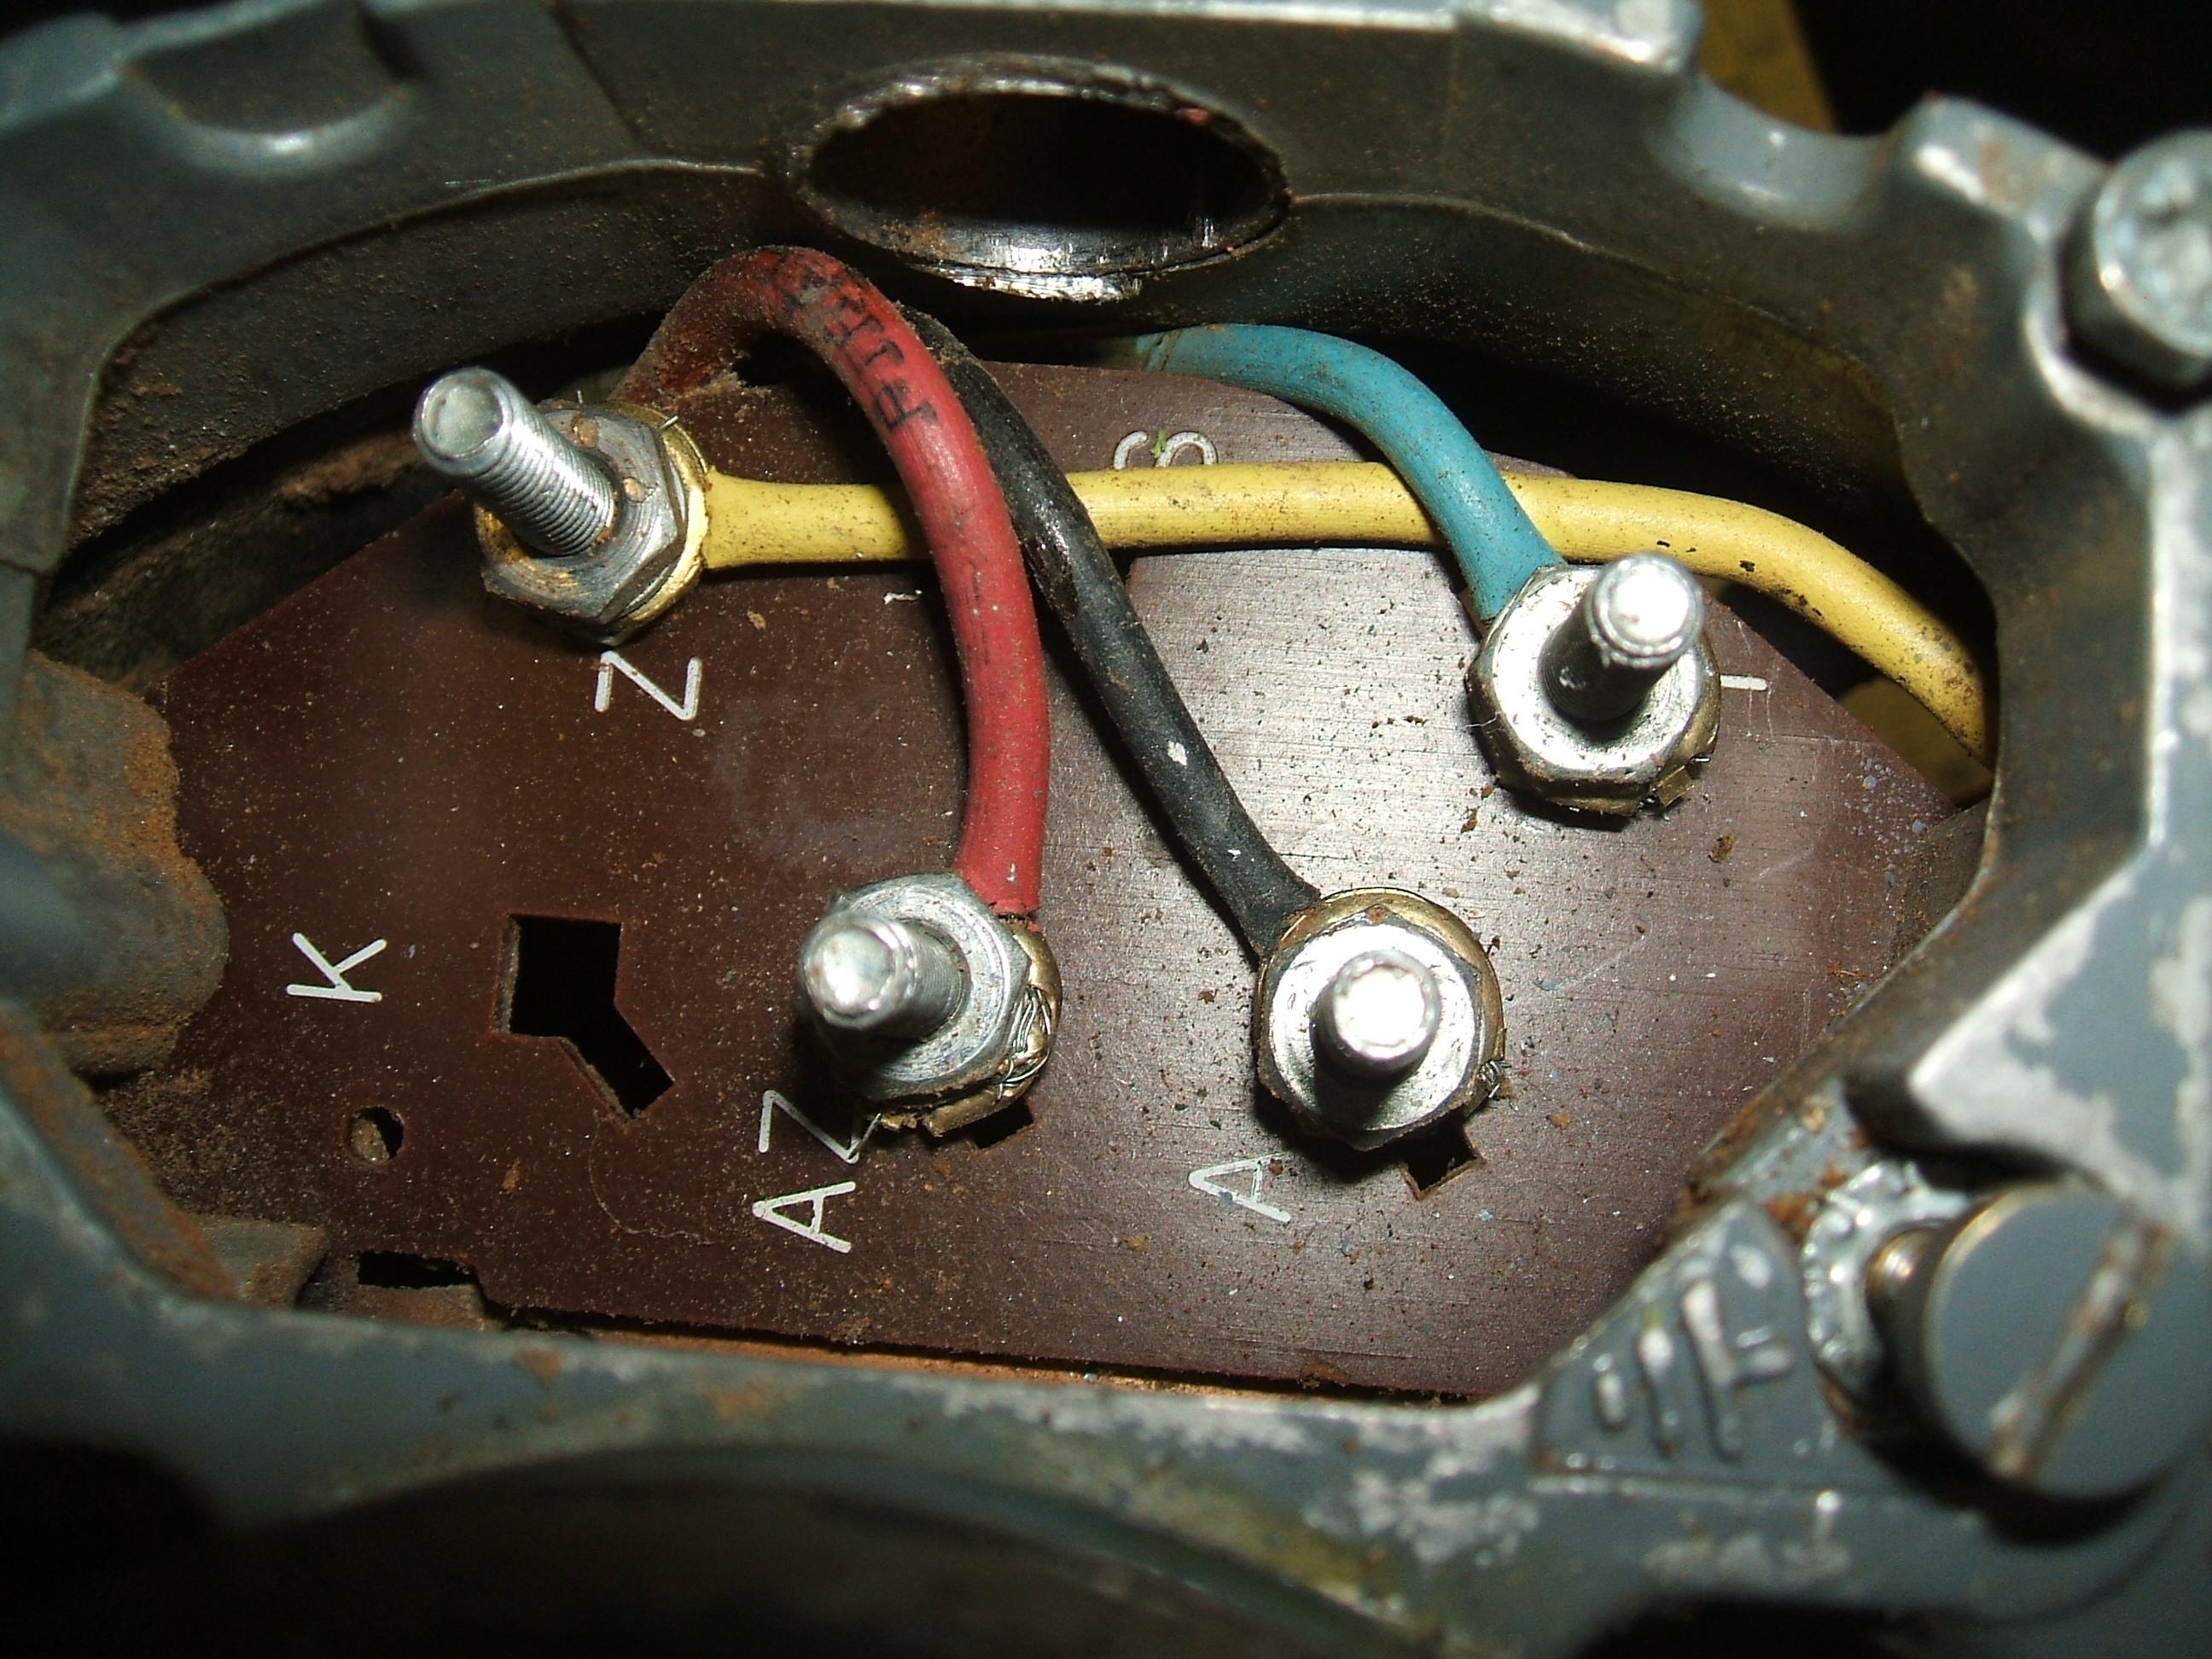 wiring up a brooke crompton single phase lathe motor myford lathe  [ 2100 x 1575 Pixel ]